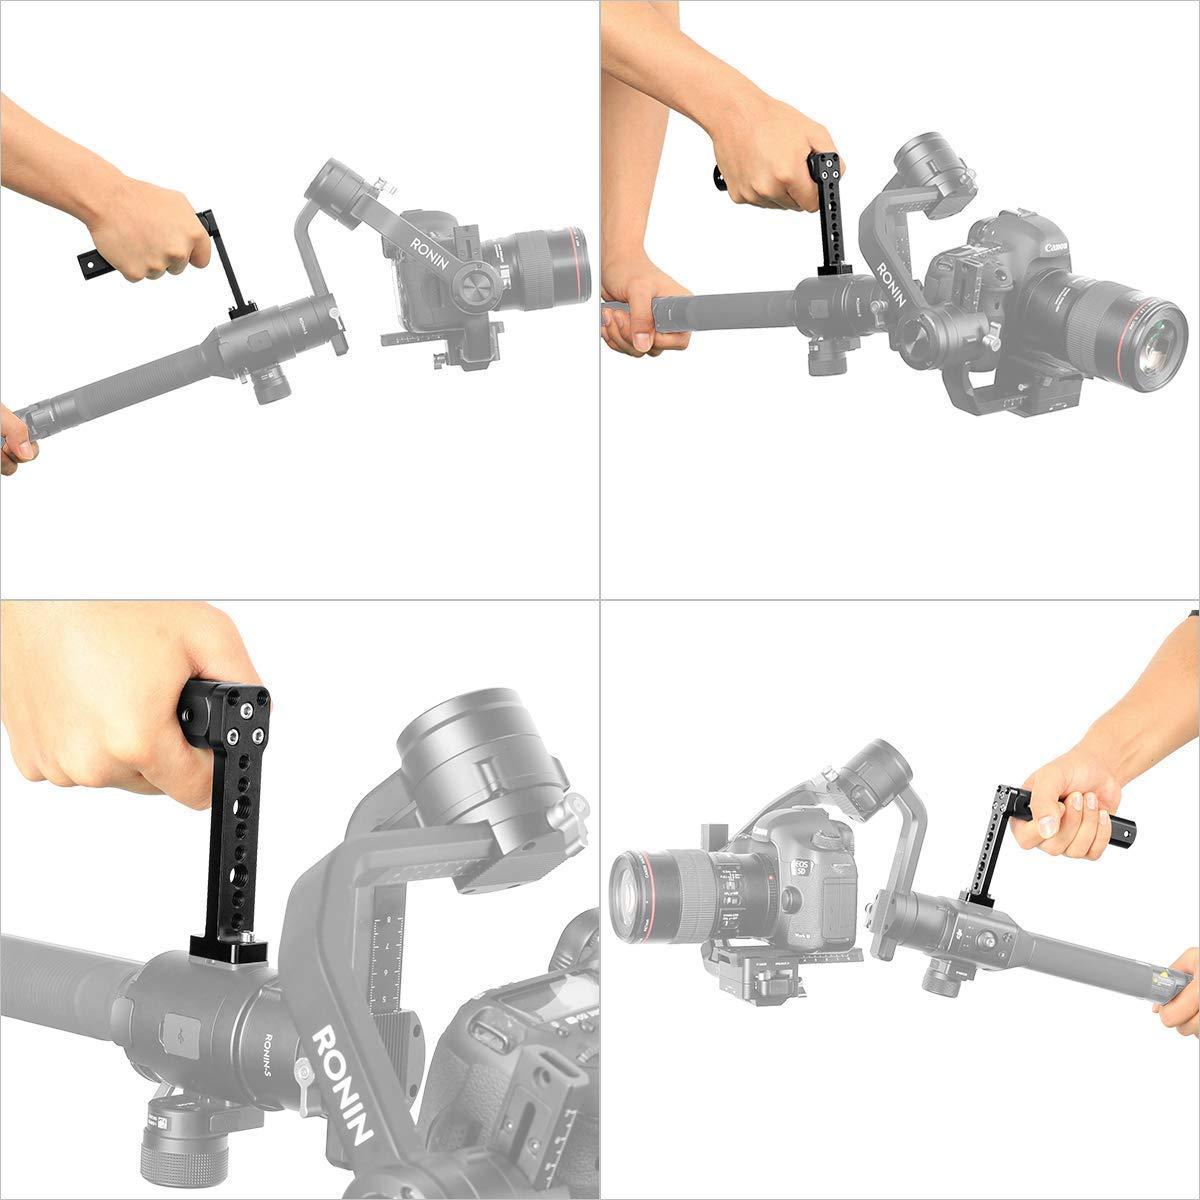 Adapter f/ür Videomonitor-Mikrofonhalterung f/ür Zhiyun Moza DJI Hand-Gimbal-Stabilisator Ronin-s Zubeh/ör Sutefoto Dual Handle Grip Transmount Kompatibel f/ür DJI Ronin-s Zhiyun Crane 2